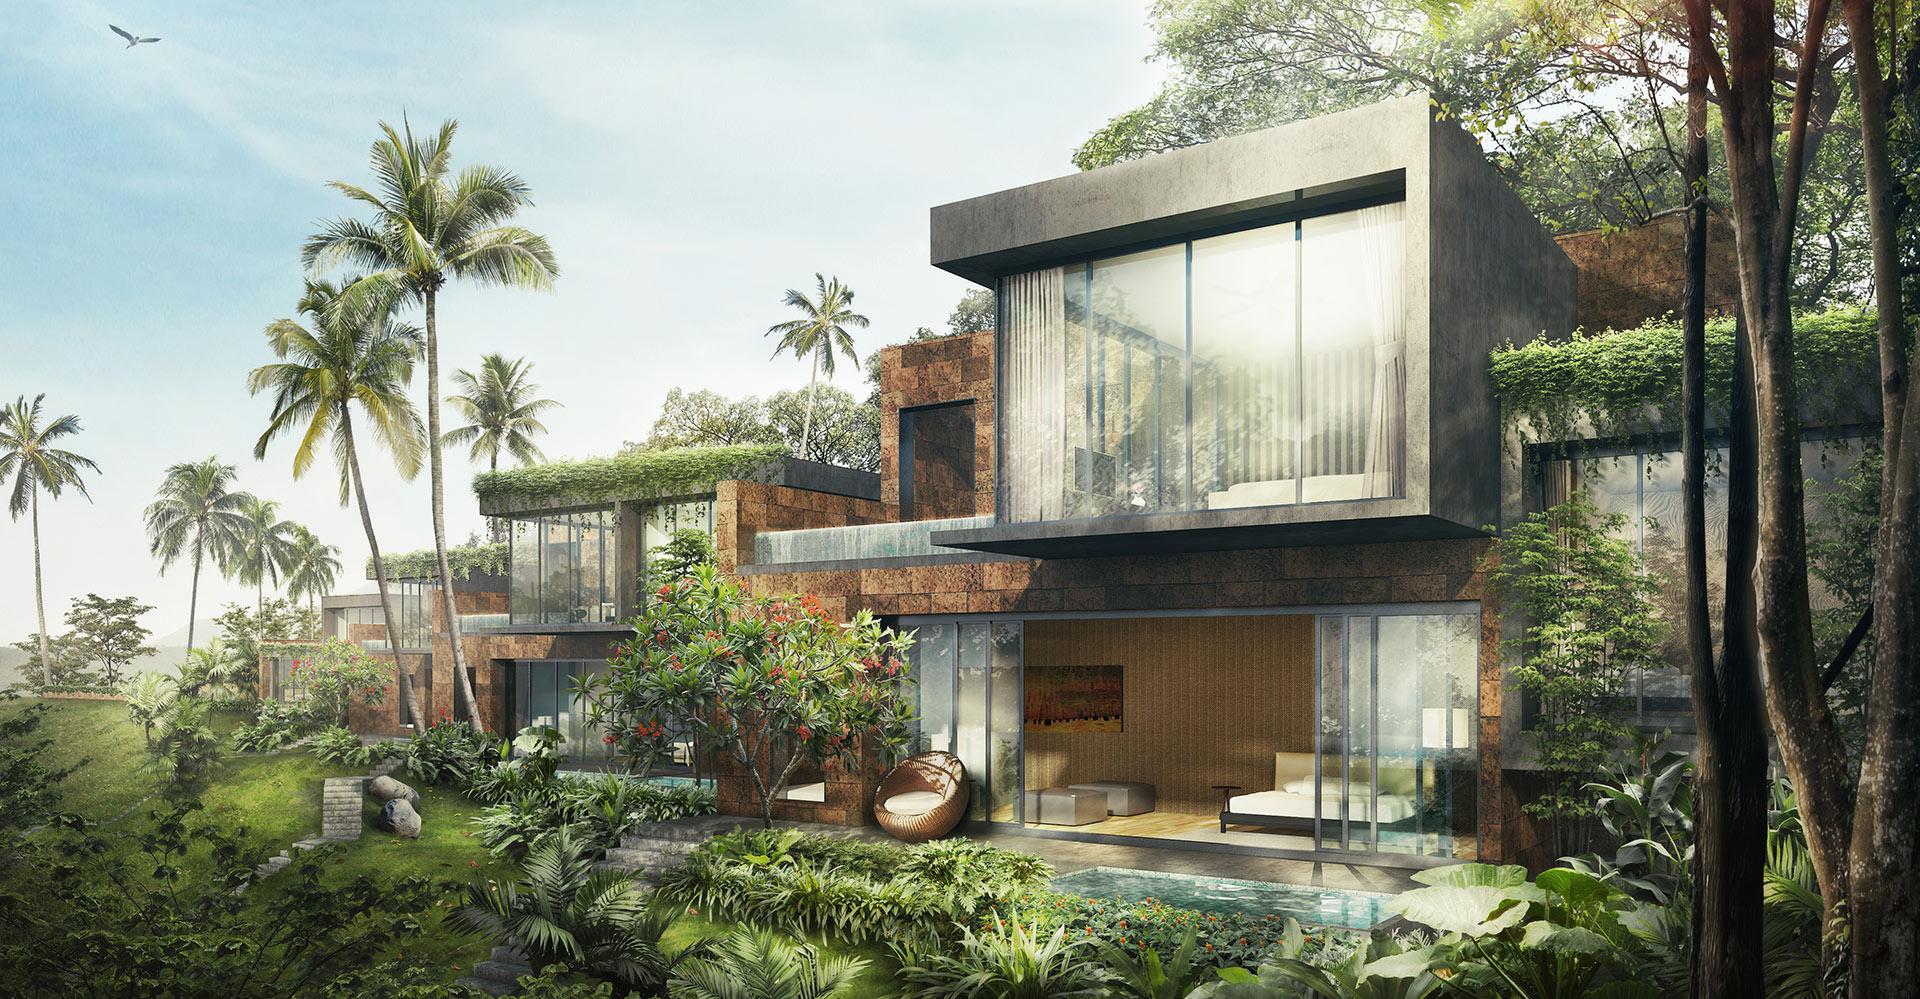 Four Seasons Golf Resort Residences - Goa India - WATG - guest house